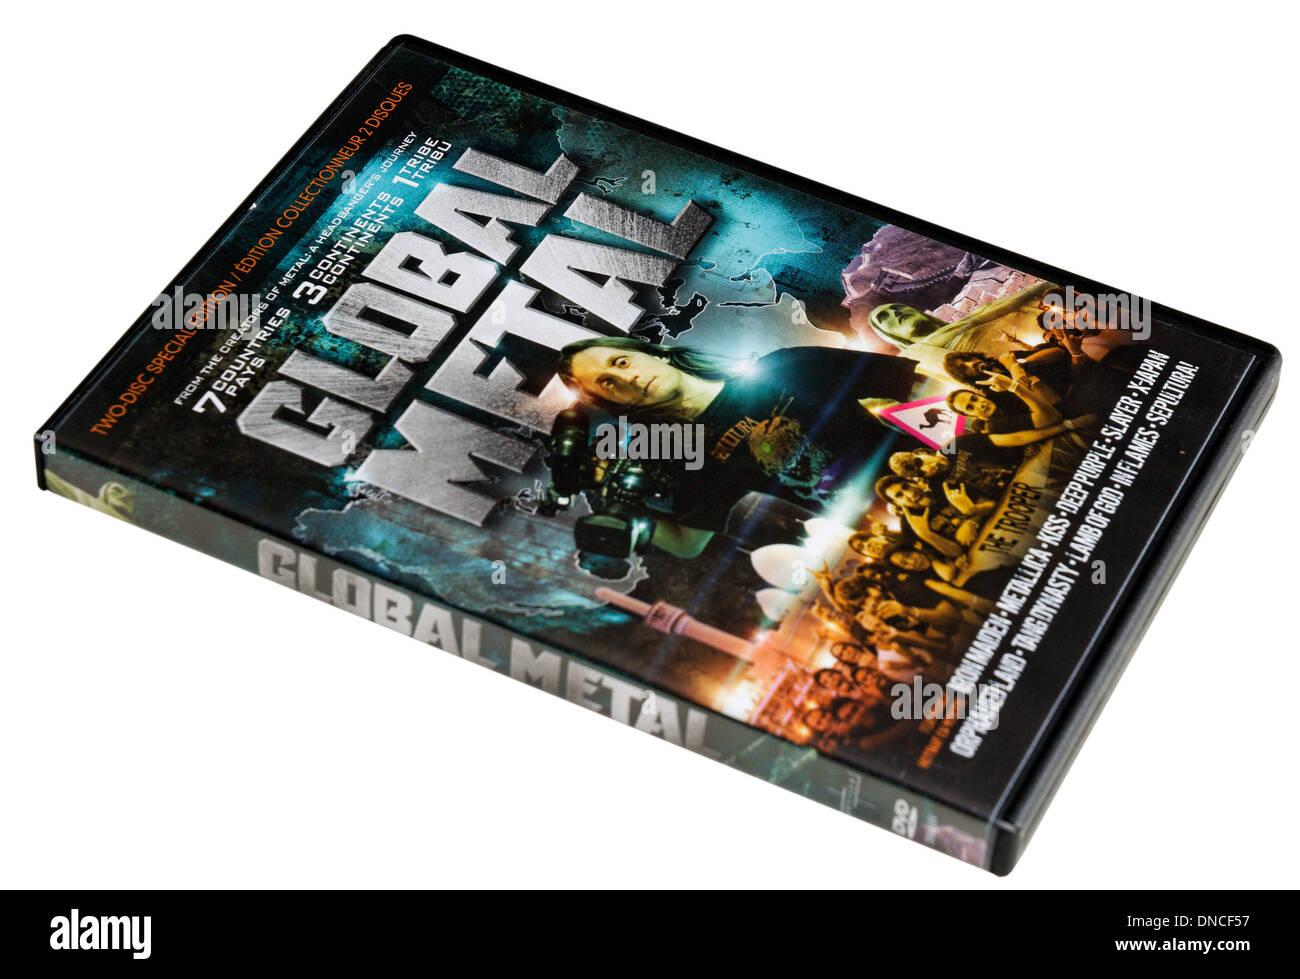 Global Metal DVD - Stock Image